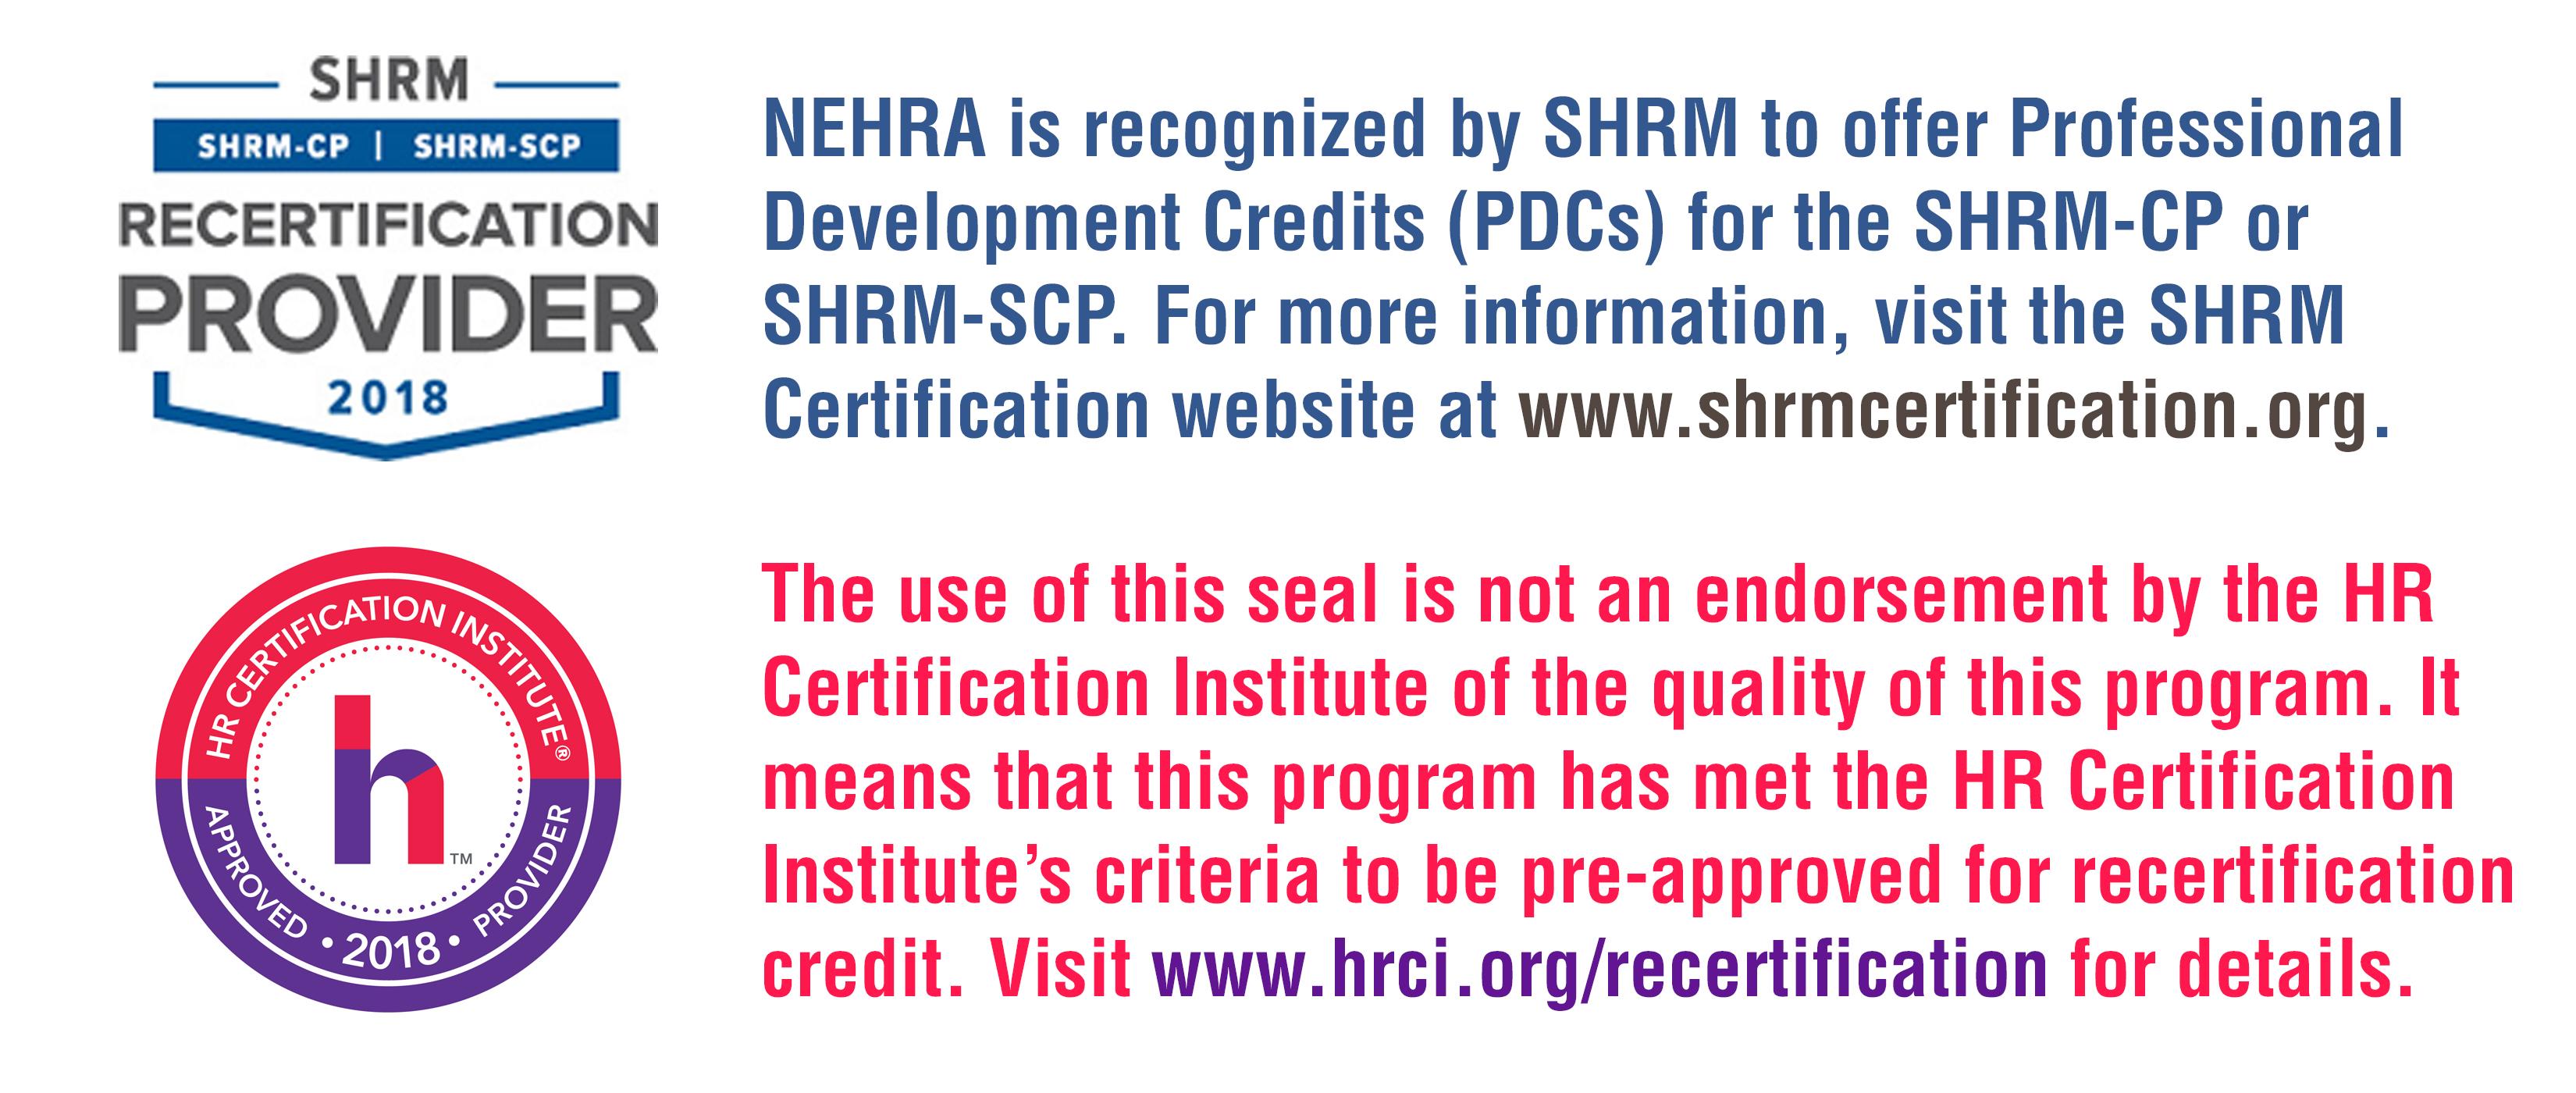 HRCI and SHRM Disclaimer